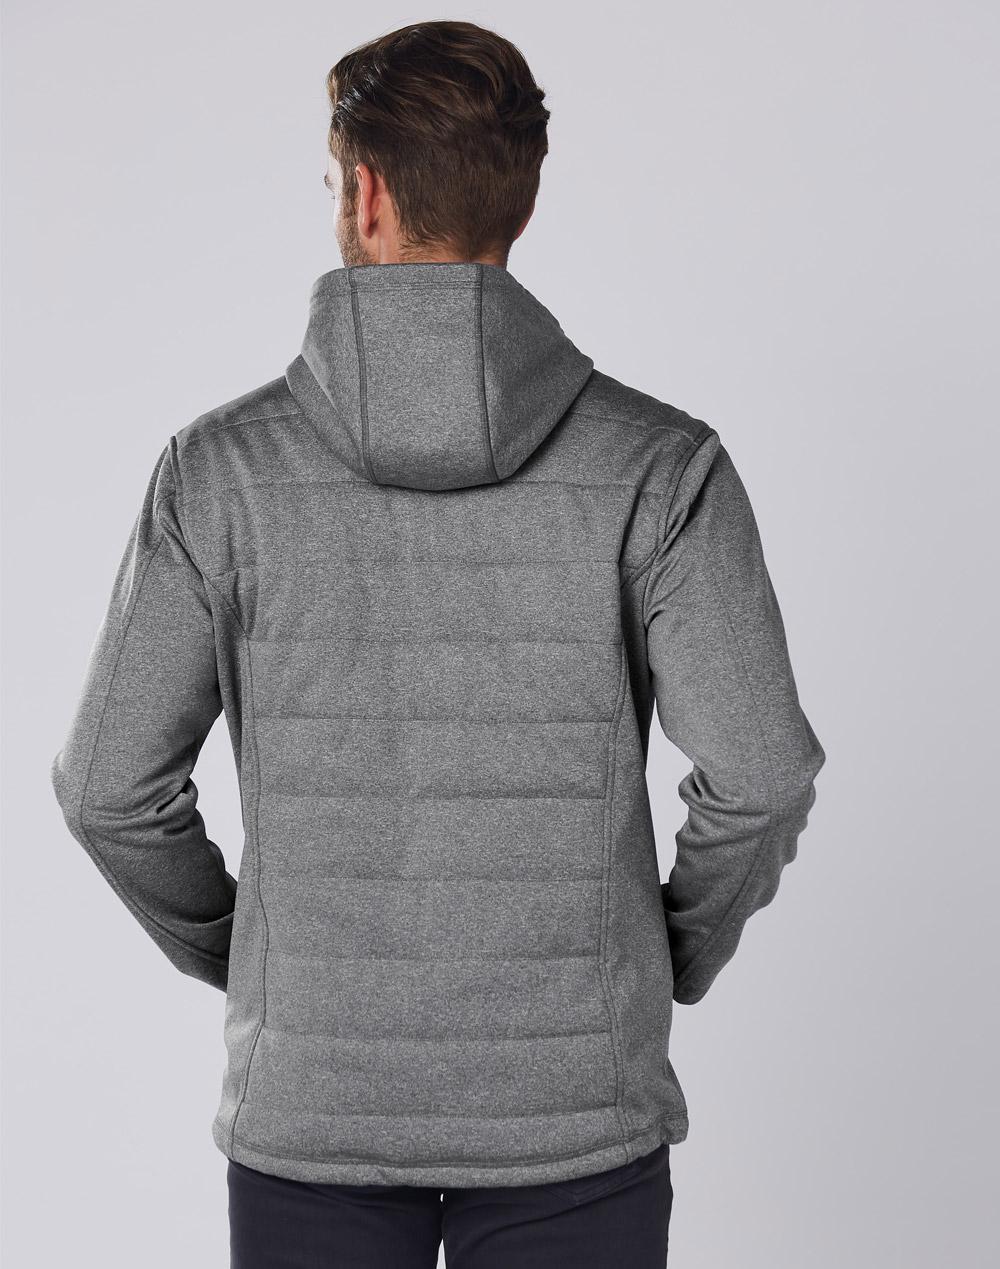 JK51 Jasper Cationic Quilted Jacket- Mens